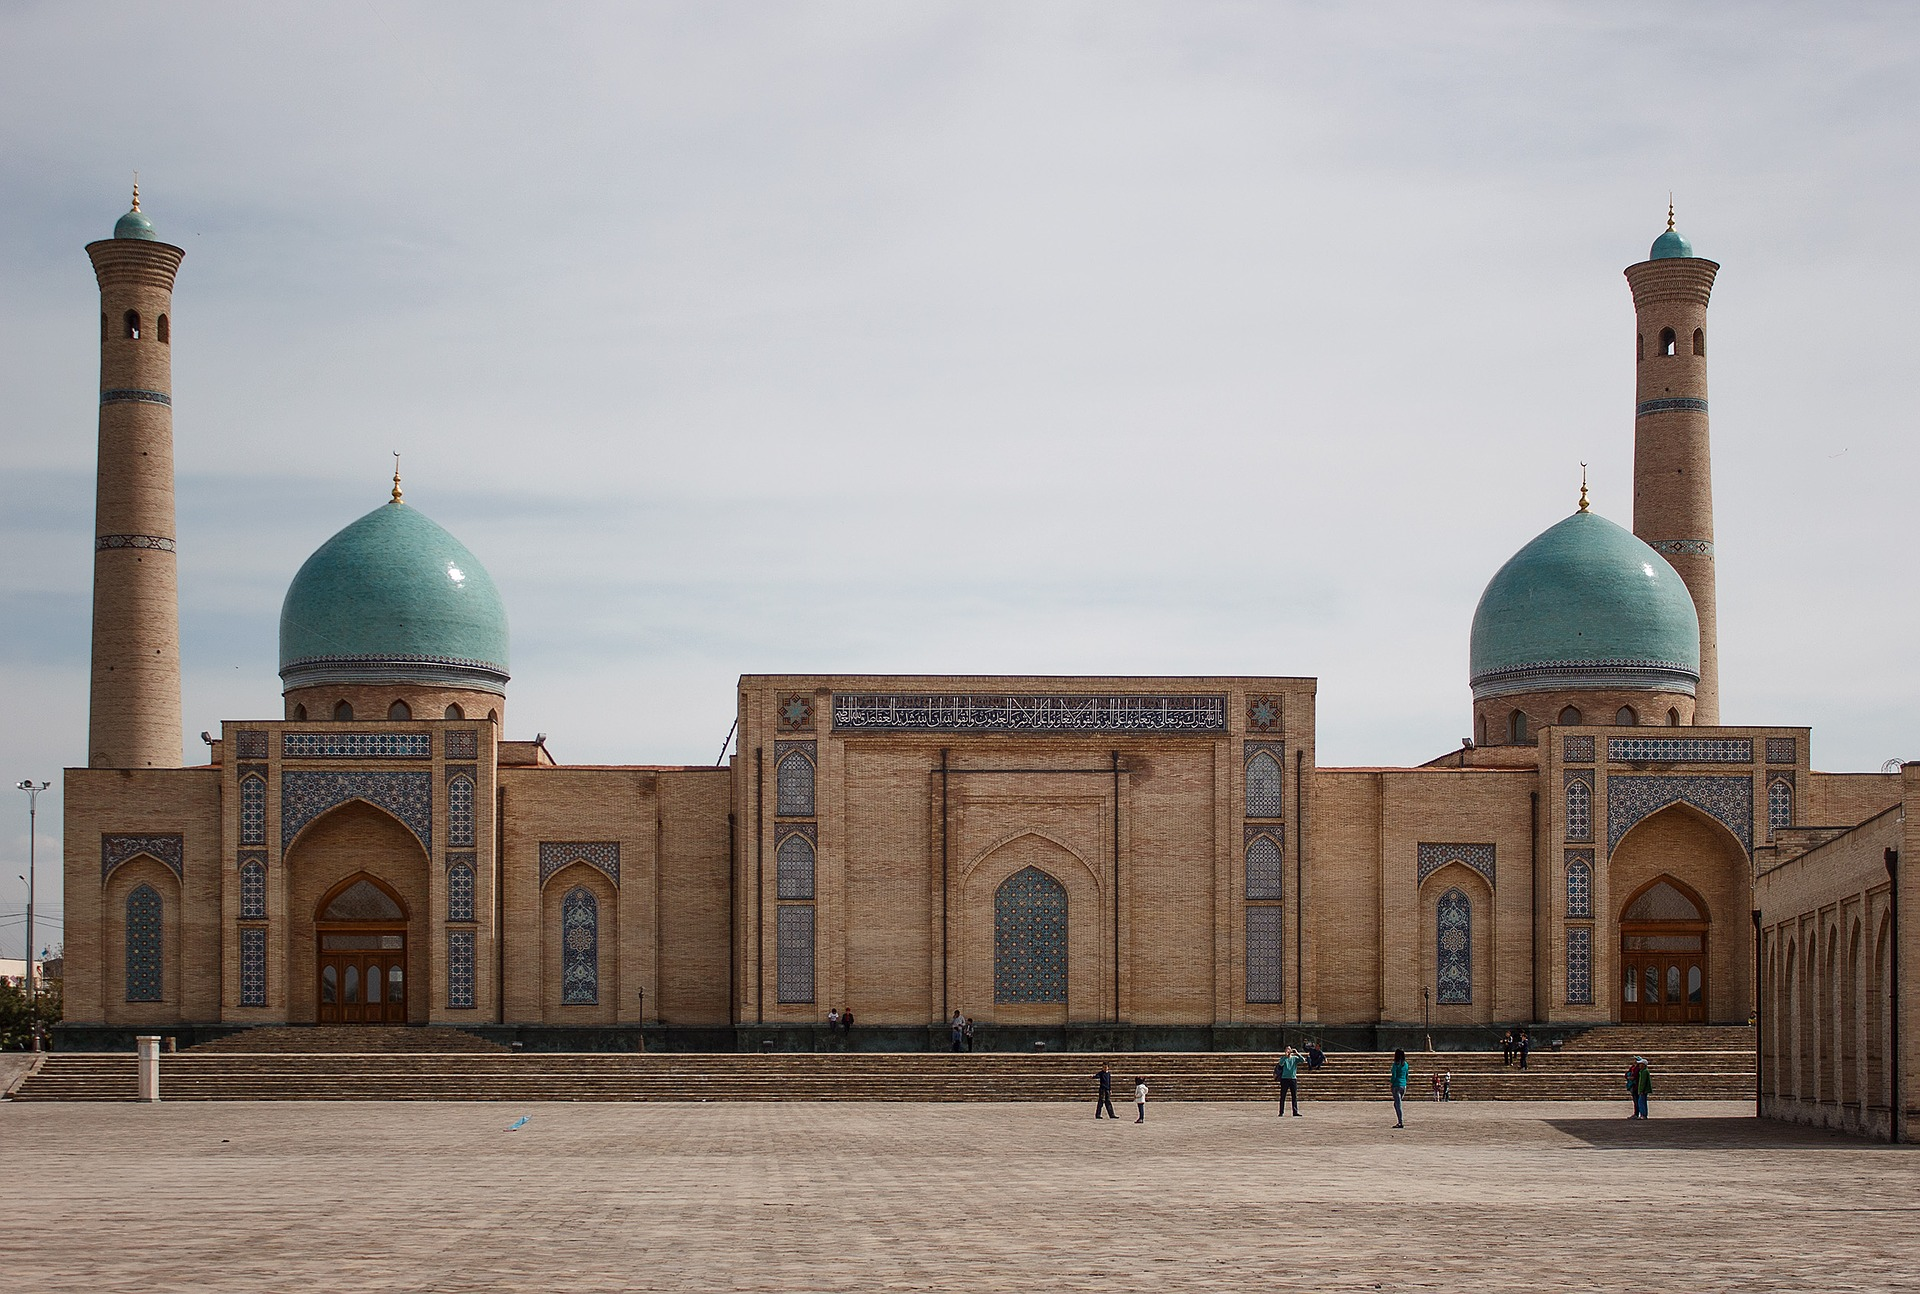 tashkent-2413252_1920.jpg